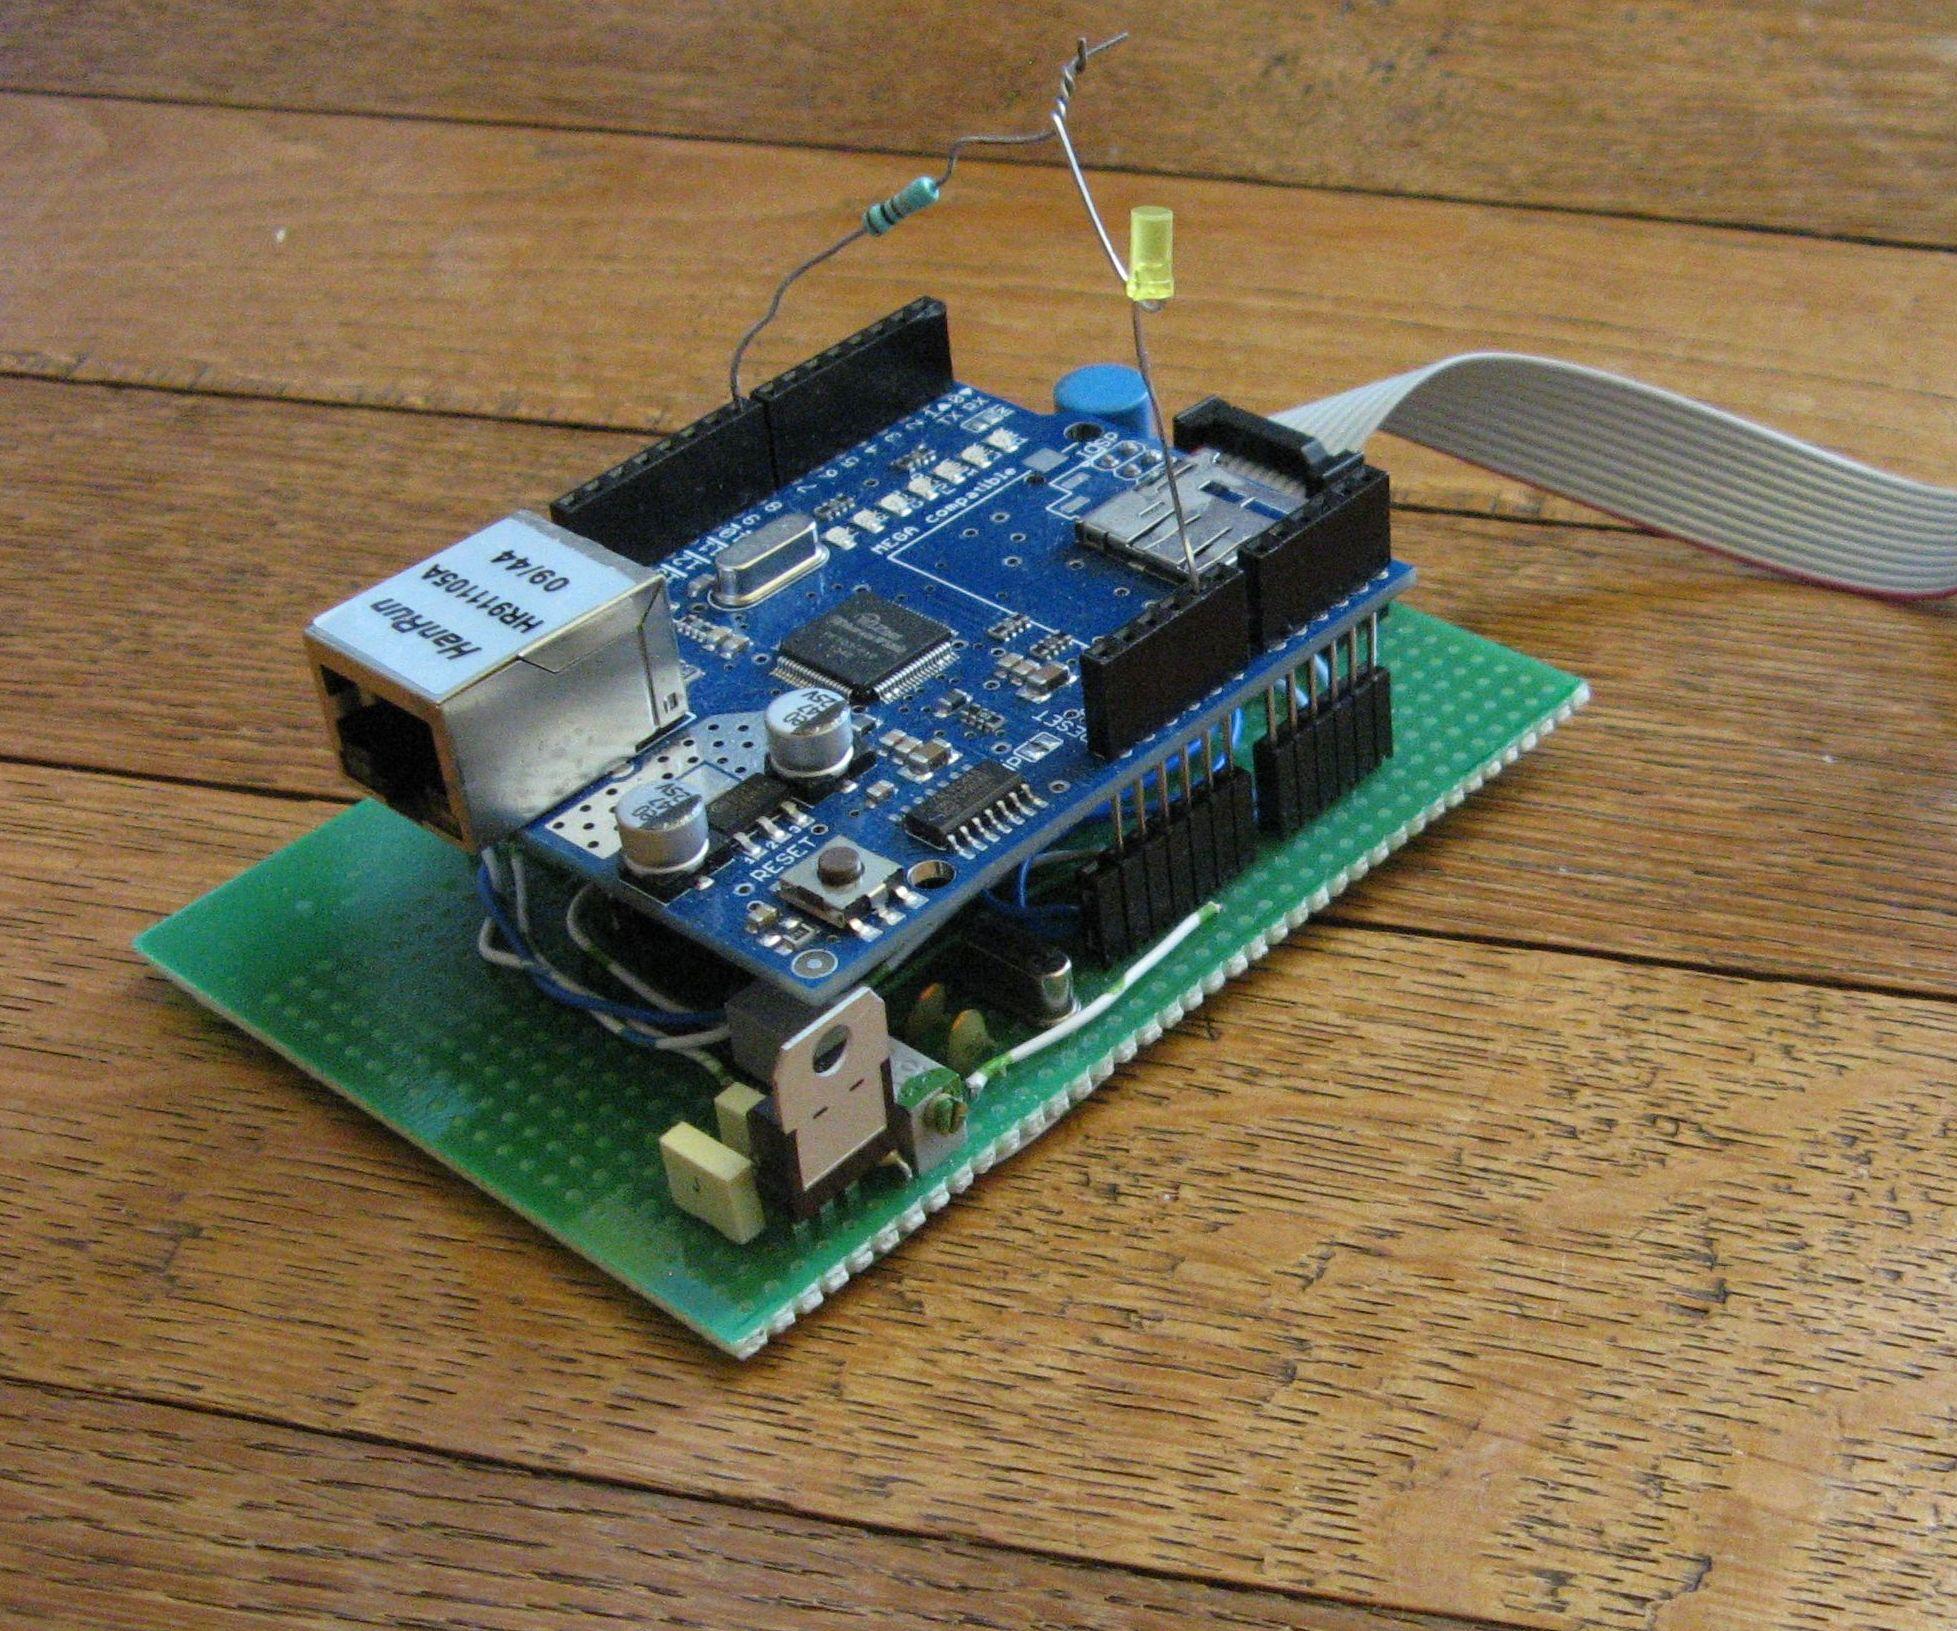 Arduino atmega644/1284 clone+ethernet shield+advancedHMI+VB NET+MODBUS TCP